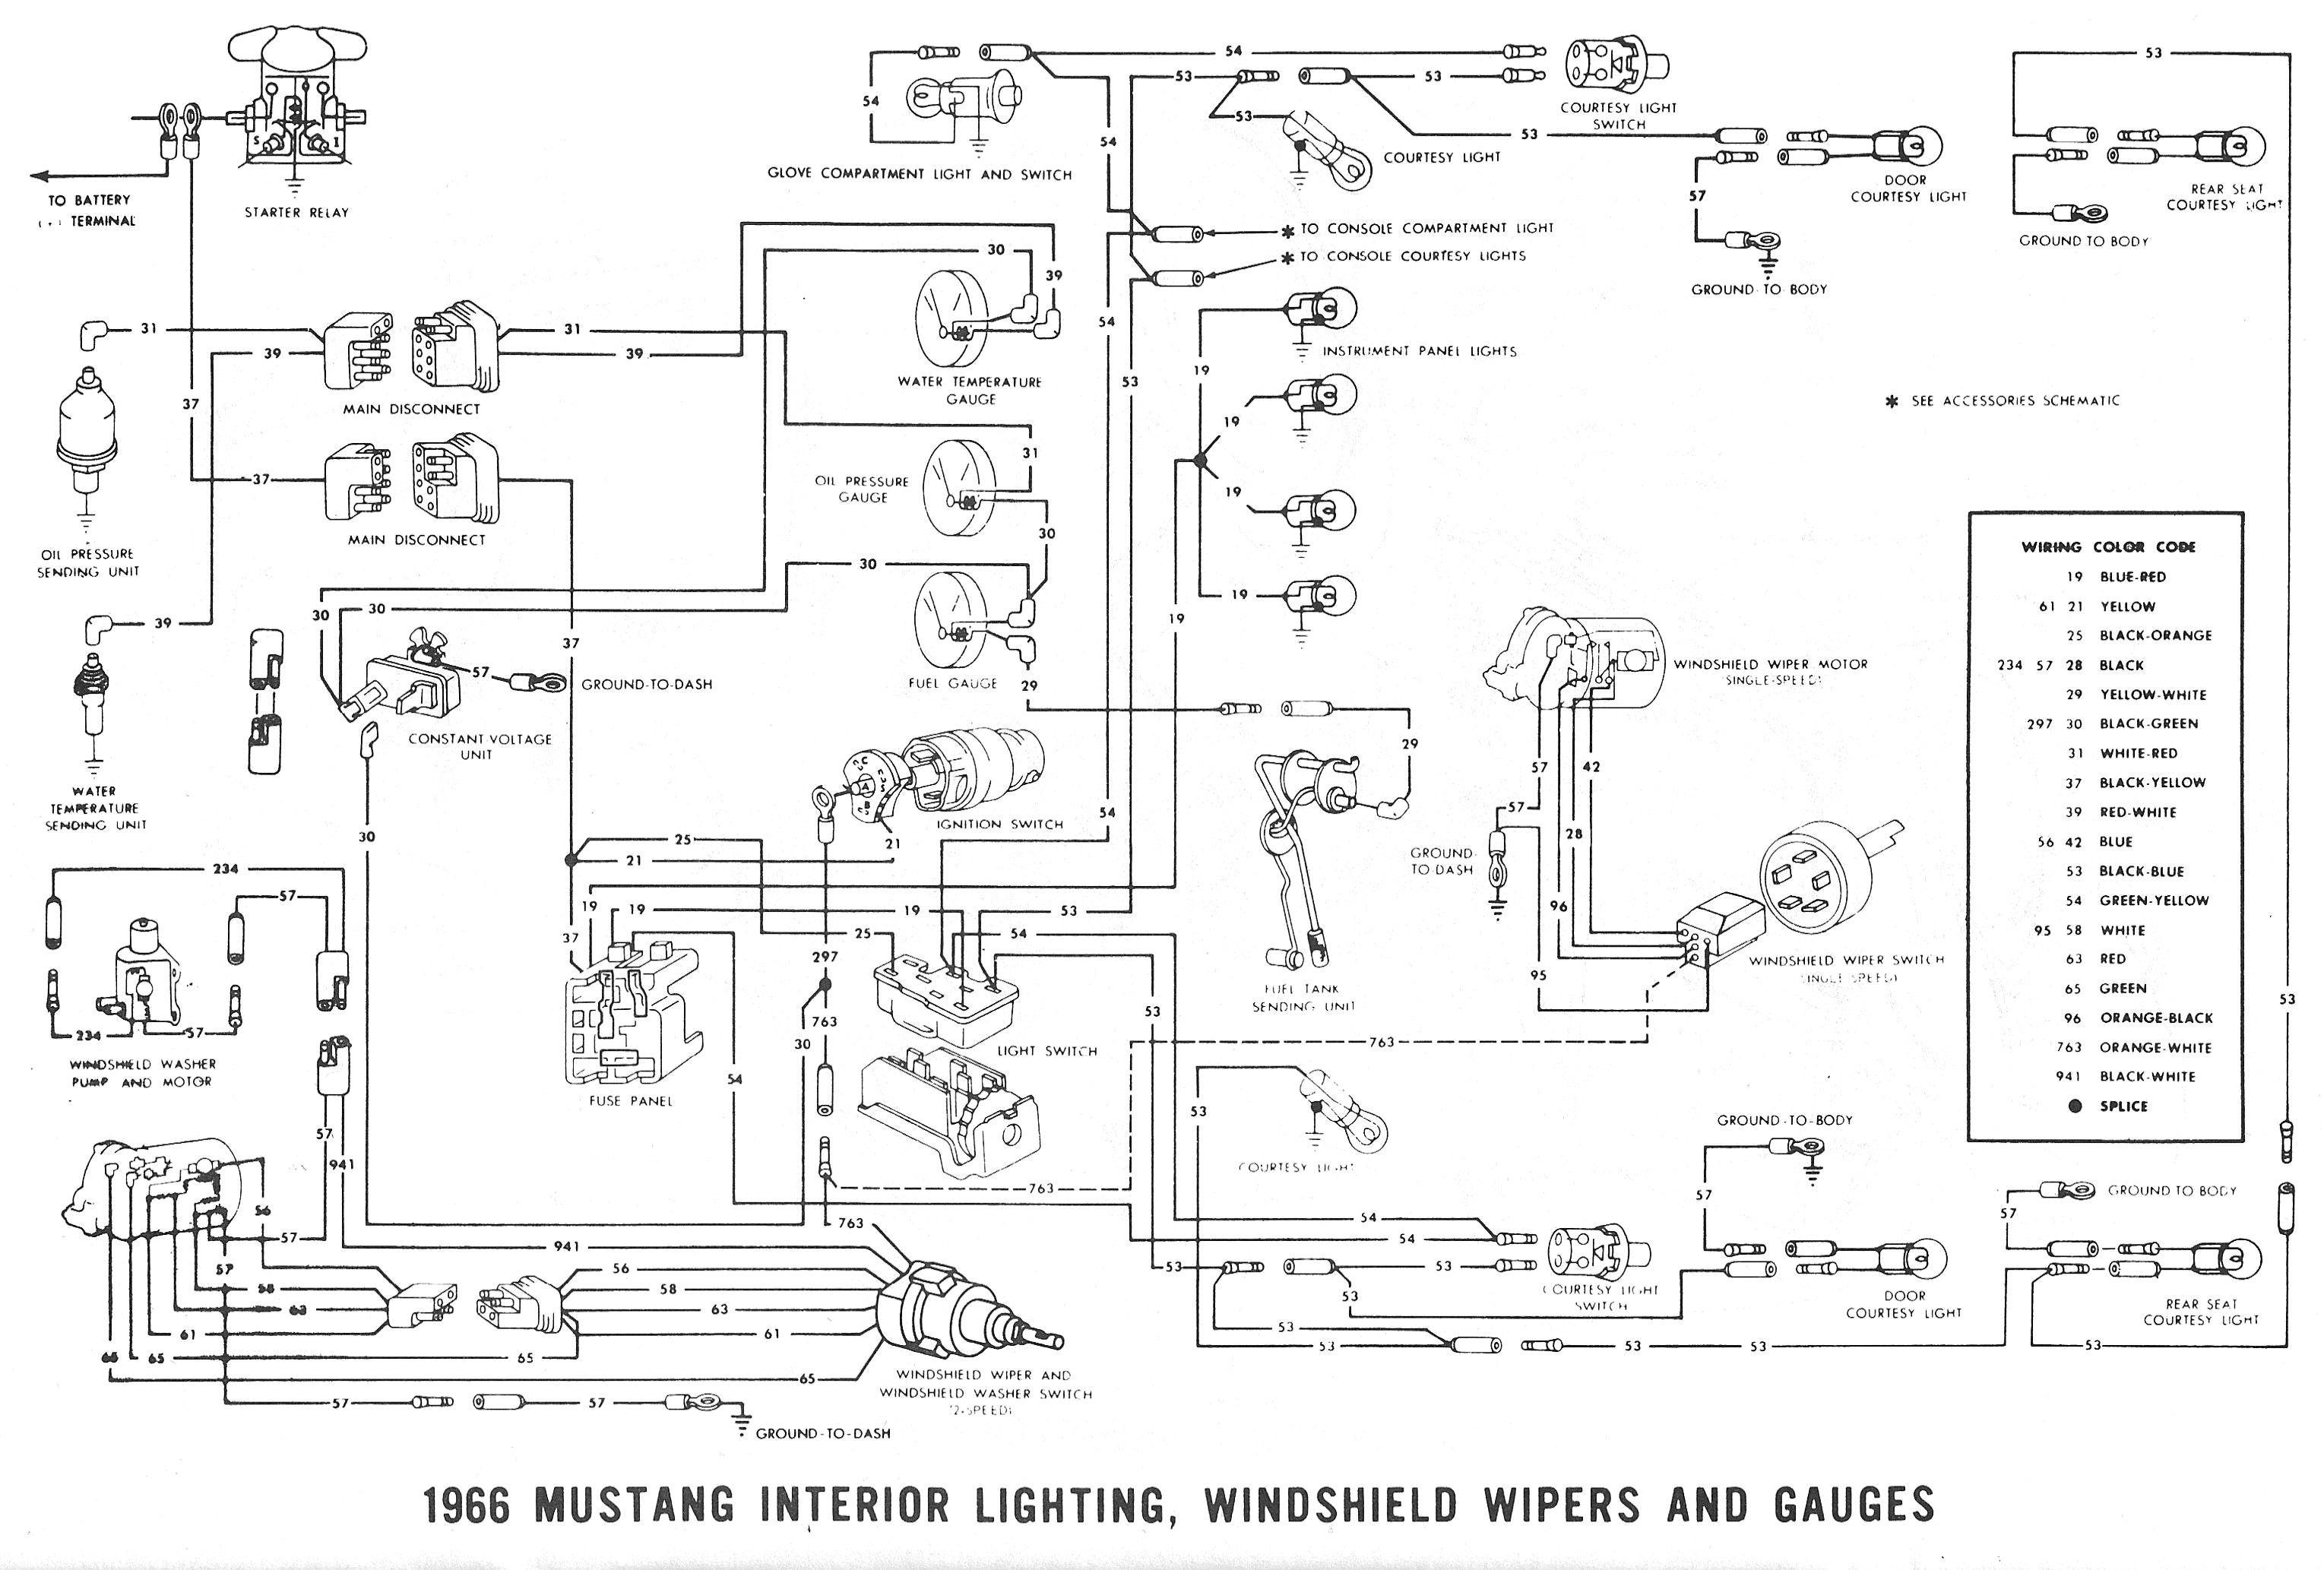 1980 Ford Mustang Headlamp Wiring